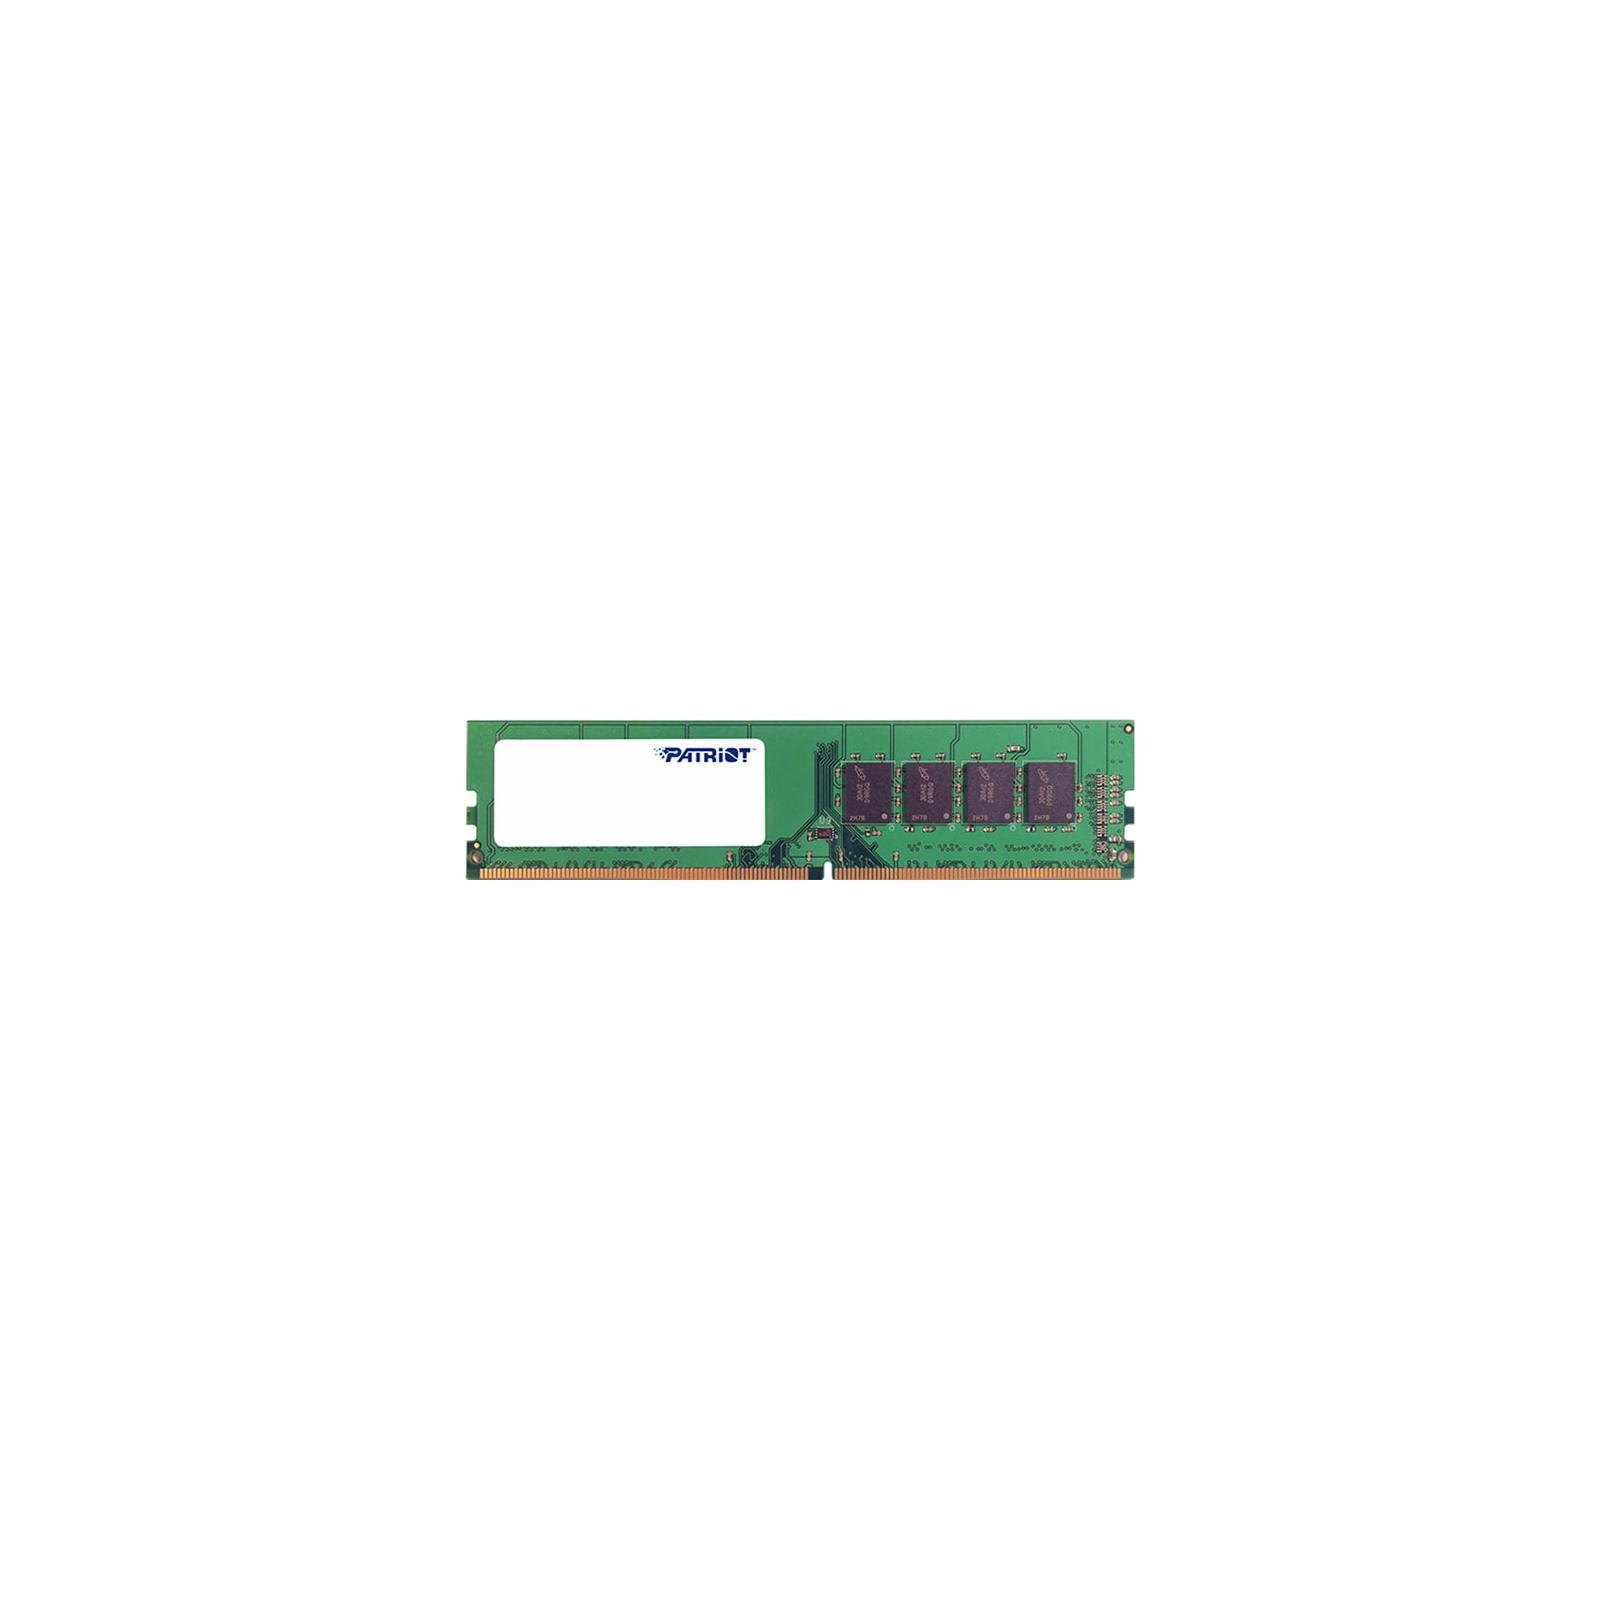 Модуль памяти для компьютера DDR4 4GB 2400 MHz Patriot (PSD44G240081)